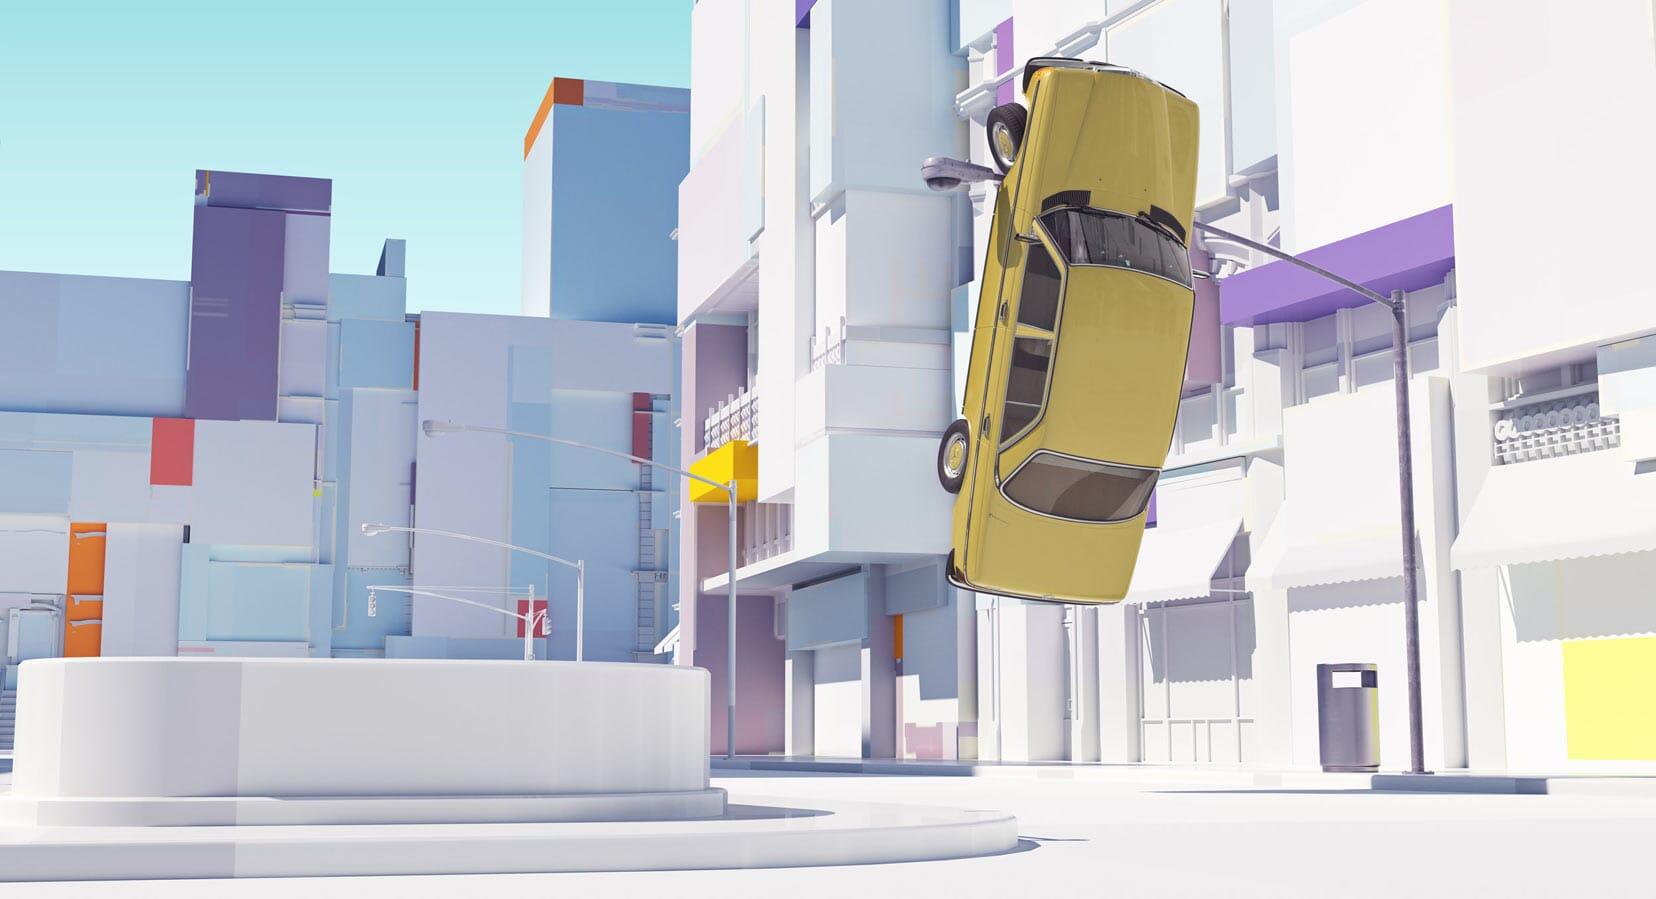 Auto Nom: An Alternative Vision Of Autonomous Mobility